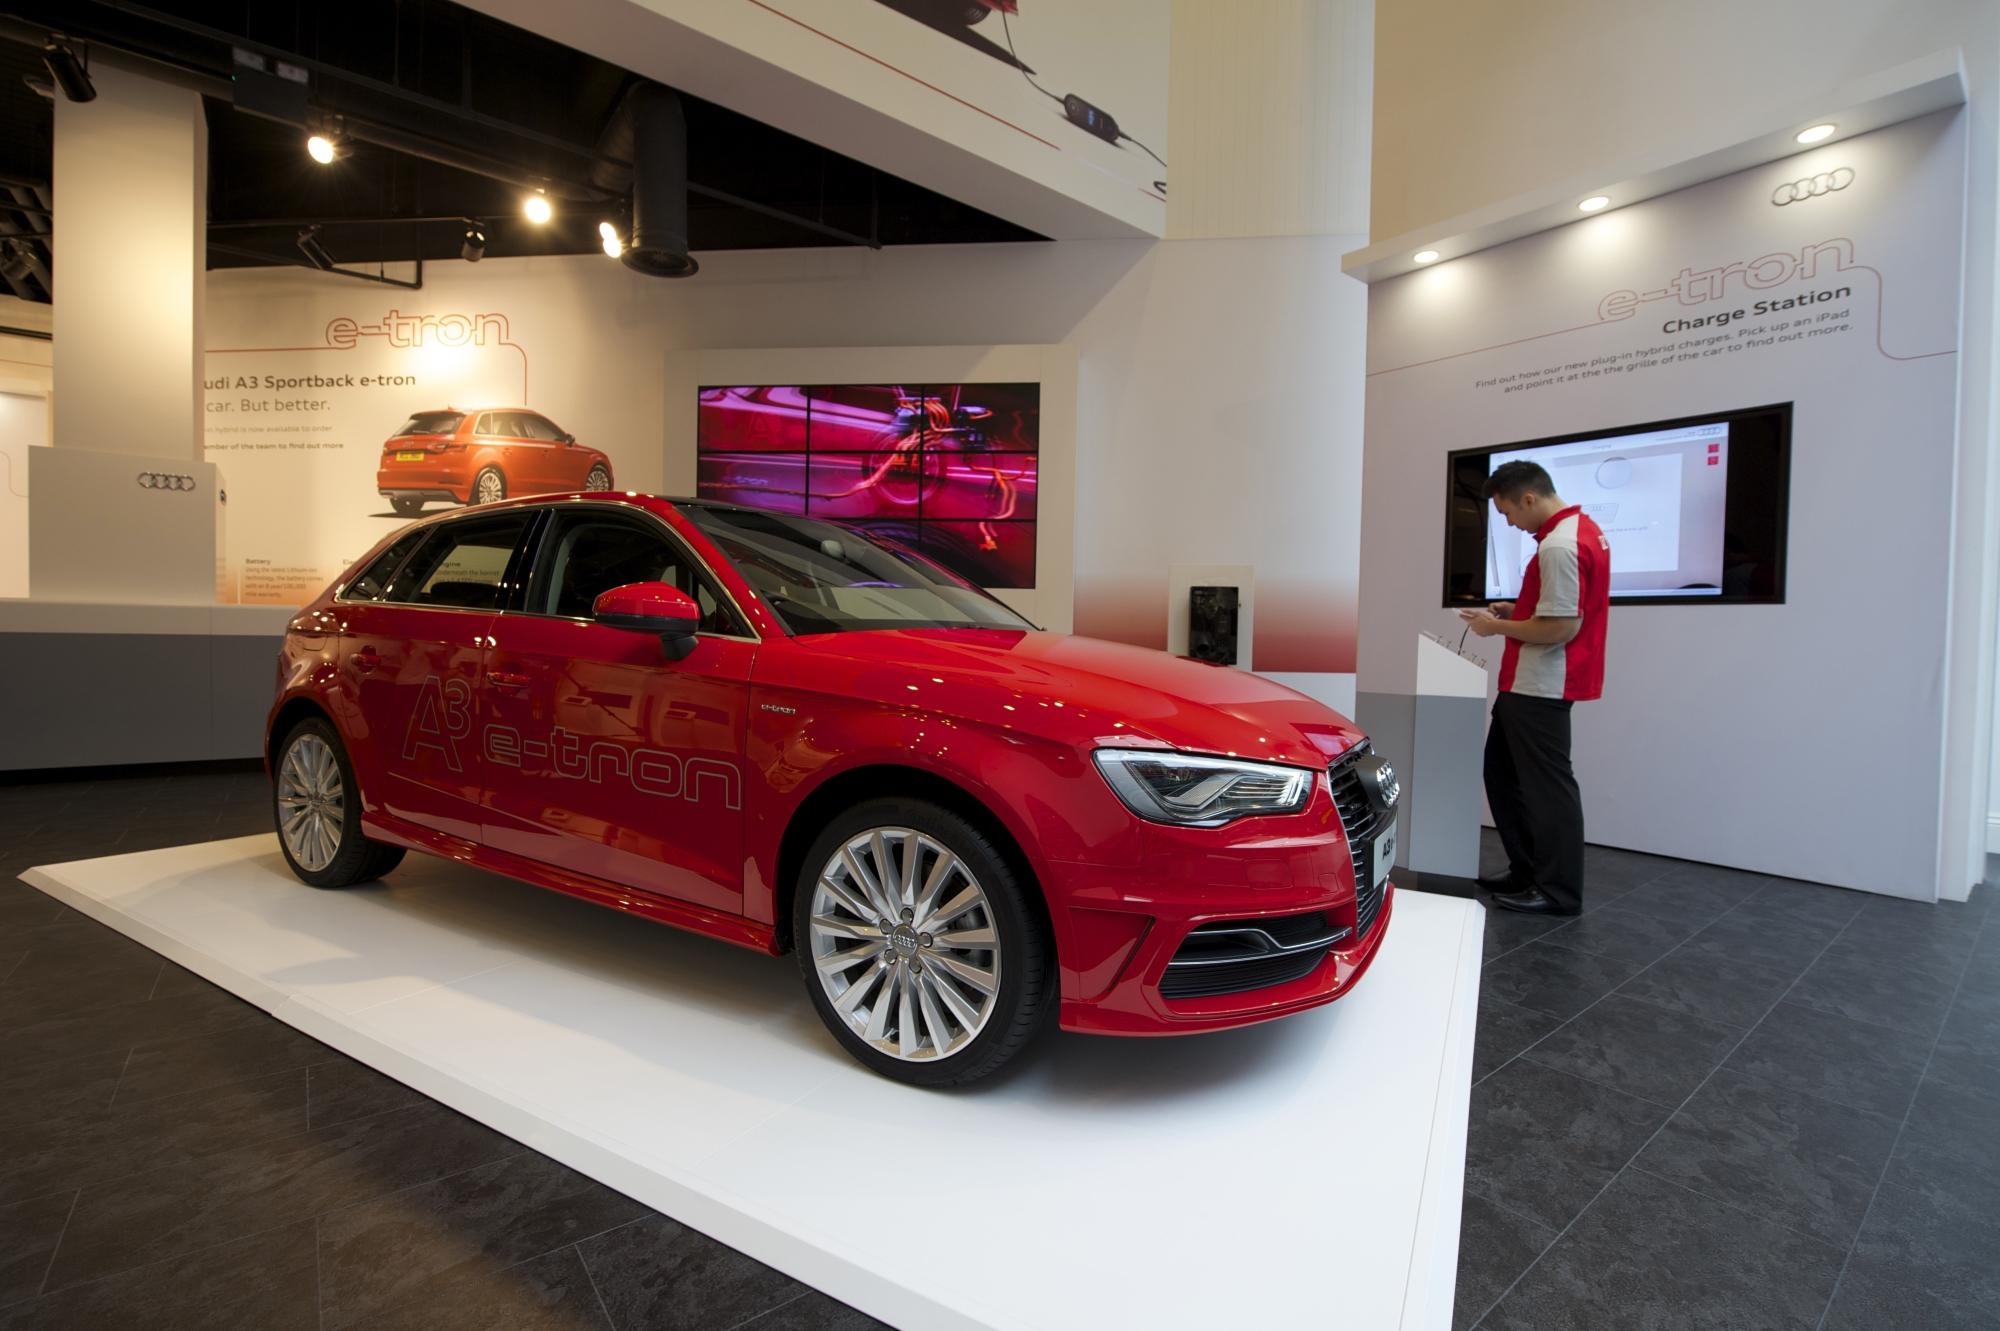 Case Study: Audi A3 Sportback e-tron Pop-up Store